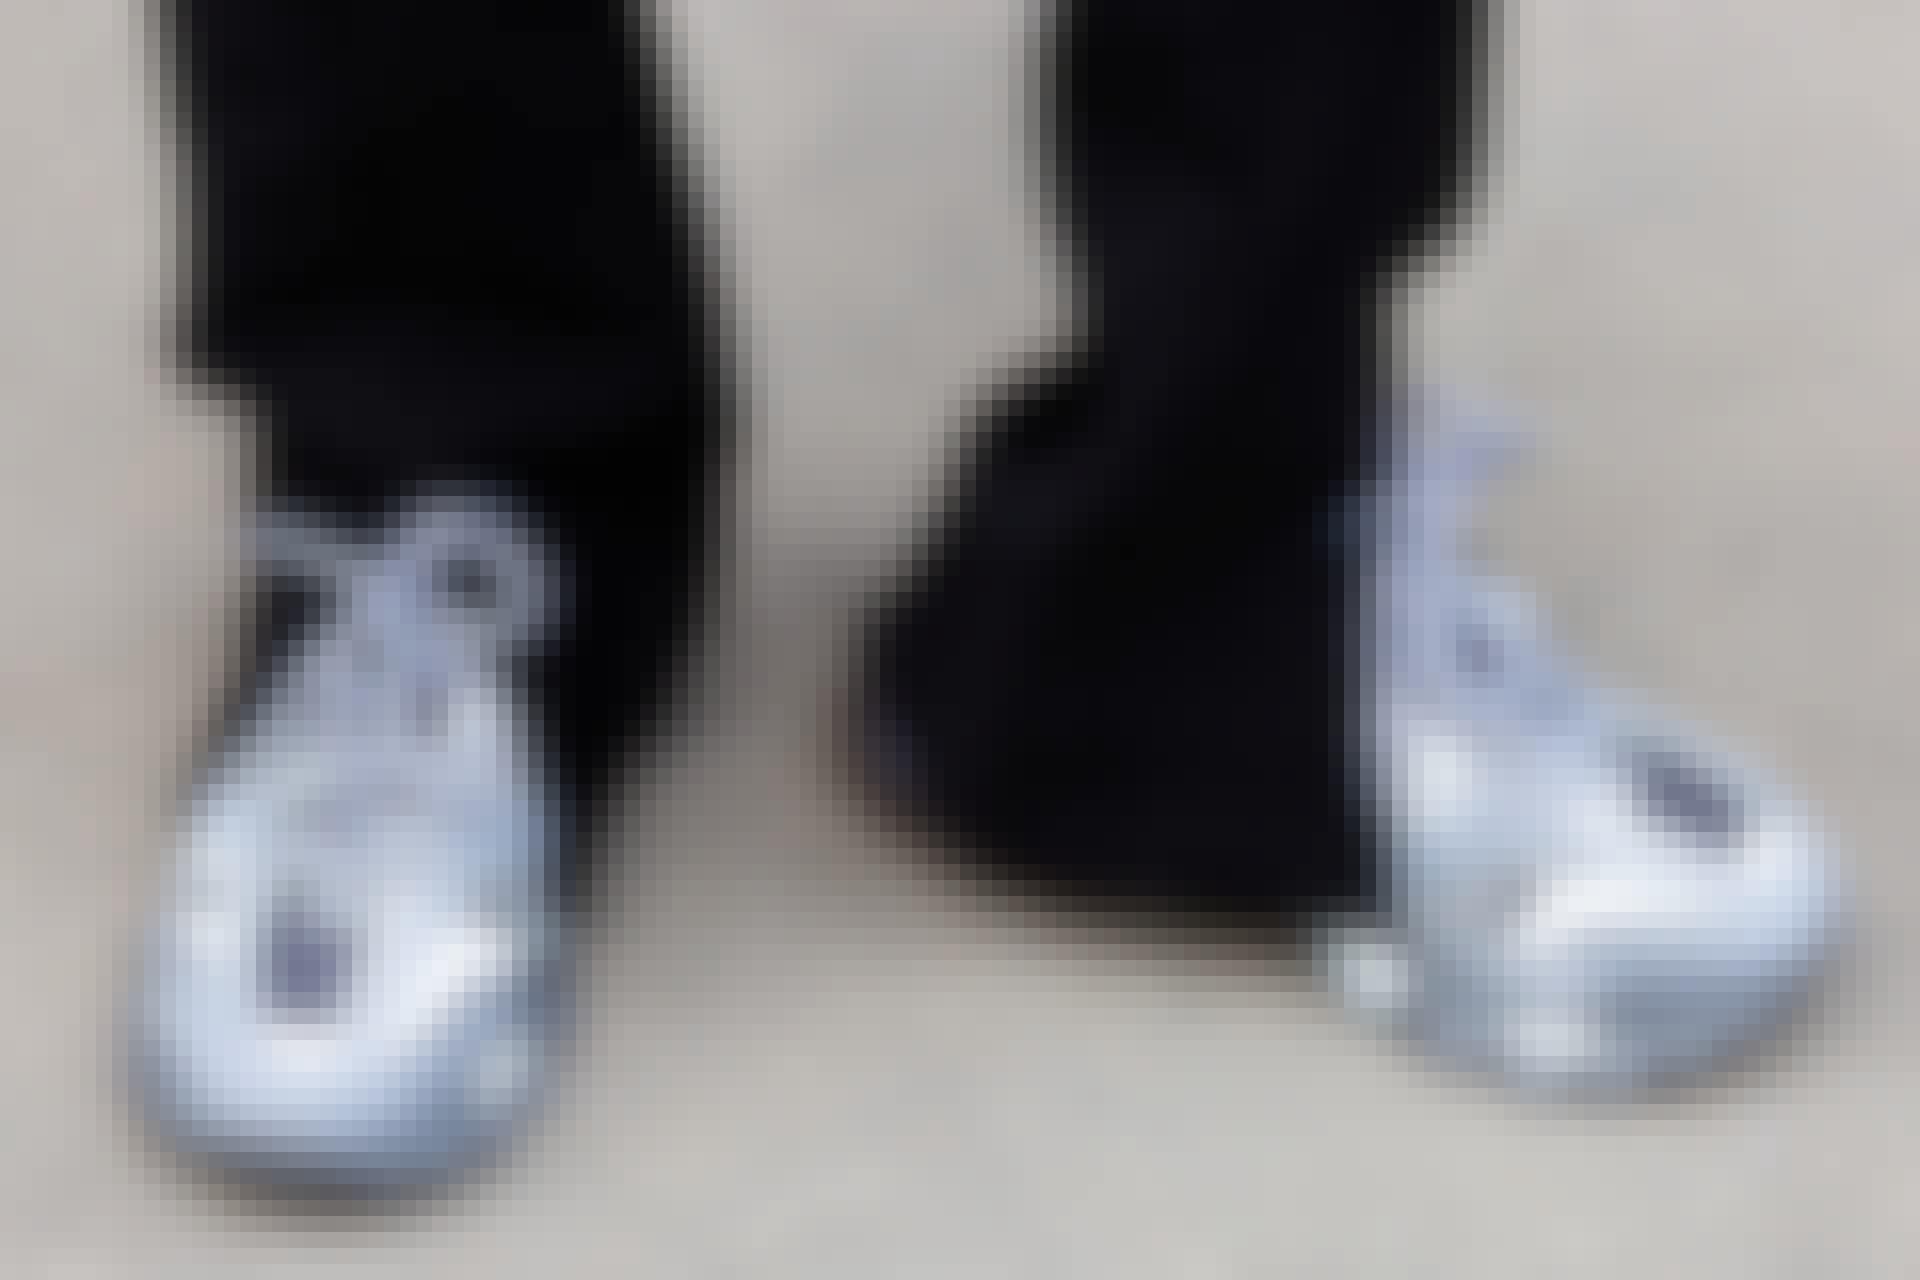 Streetstyle sneakers